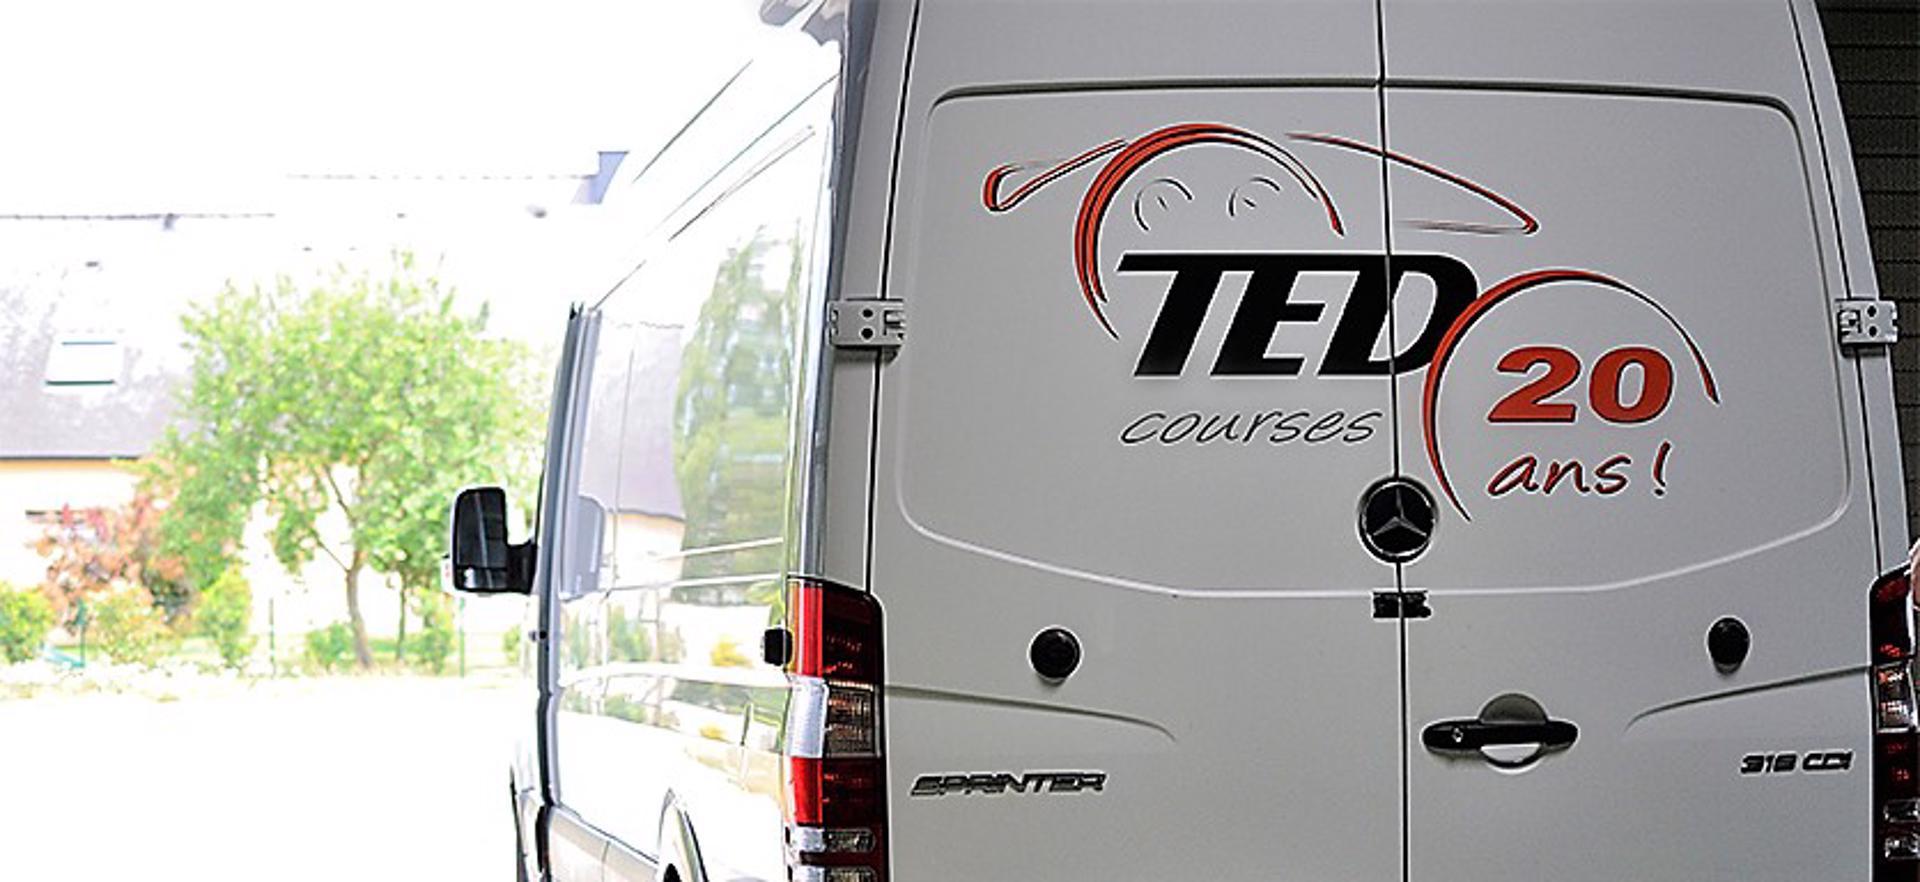 ted courses chauffeur permis eb h f. Black Bedroom Furniture Sets. Home Design Ideas